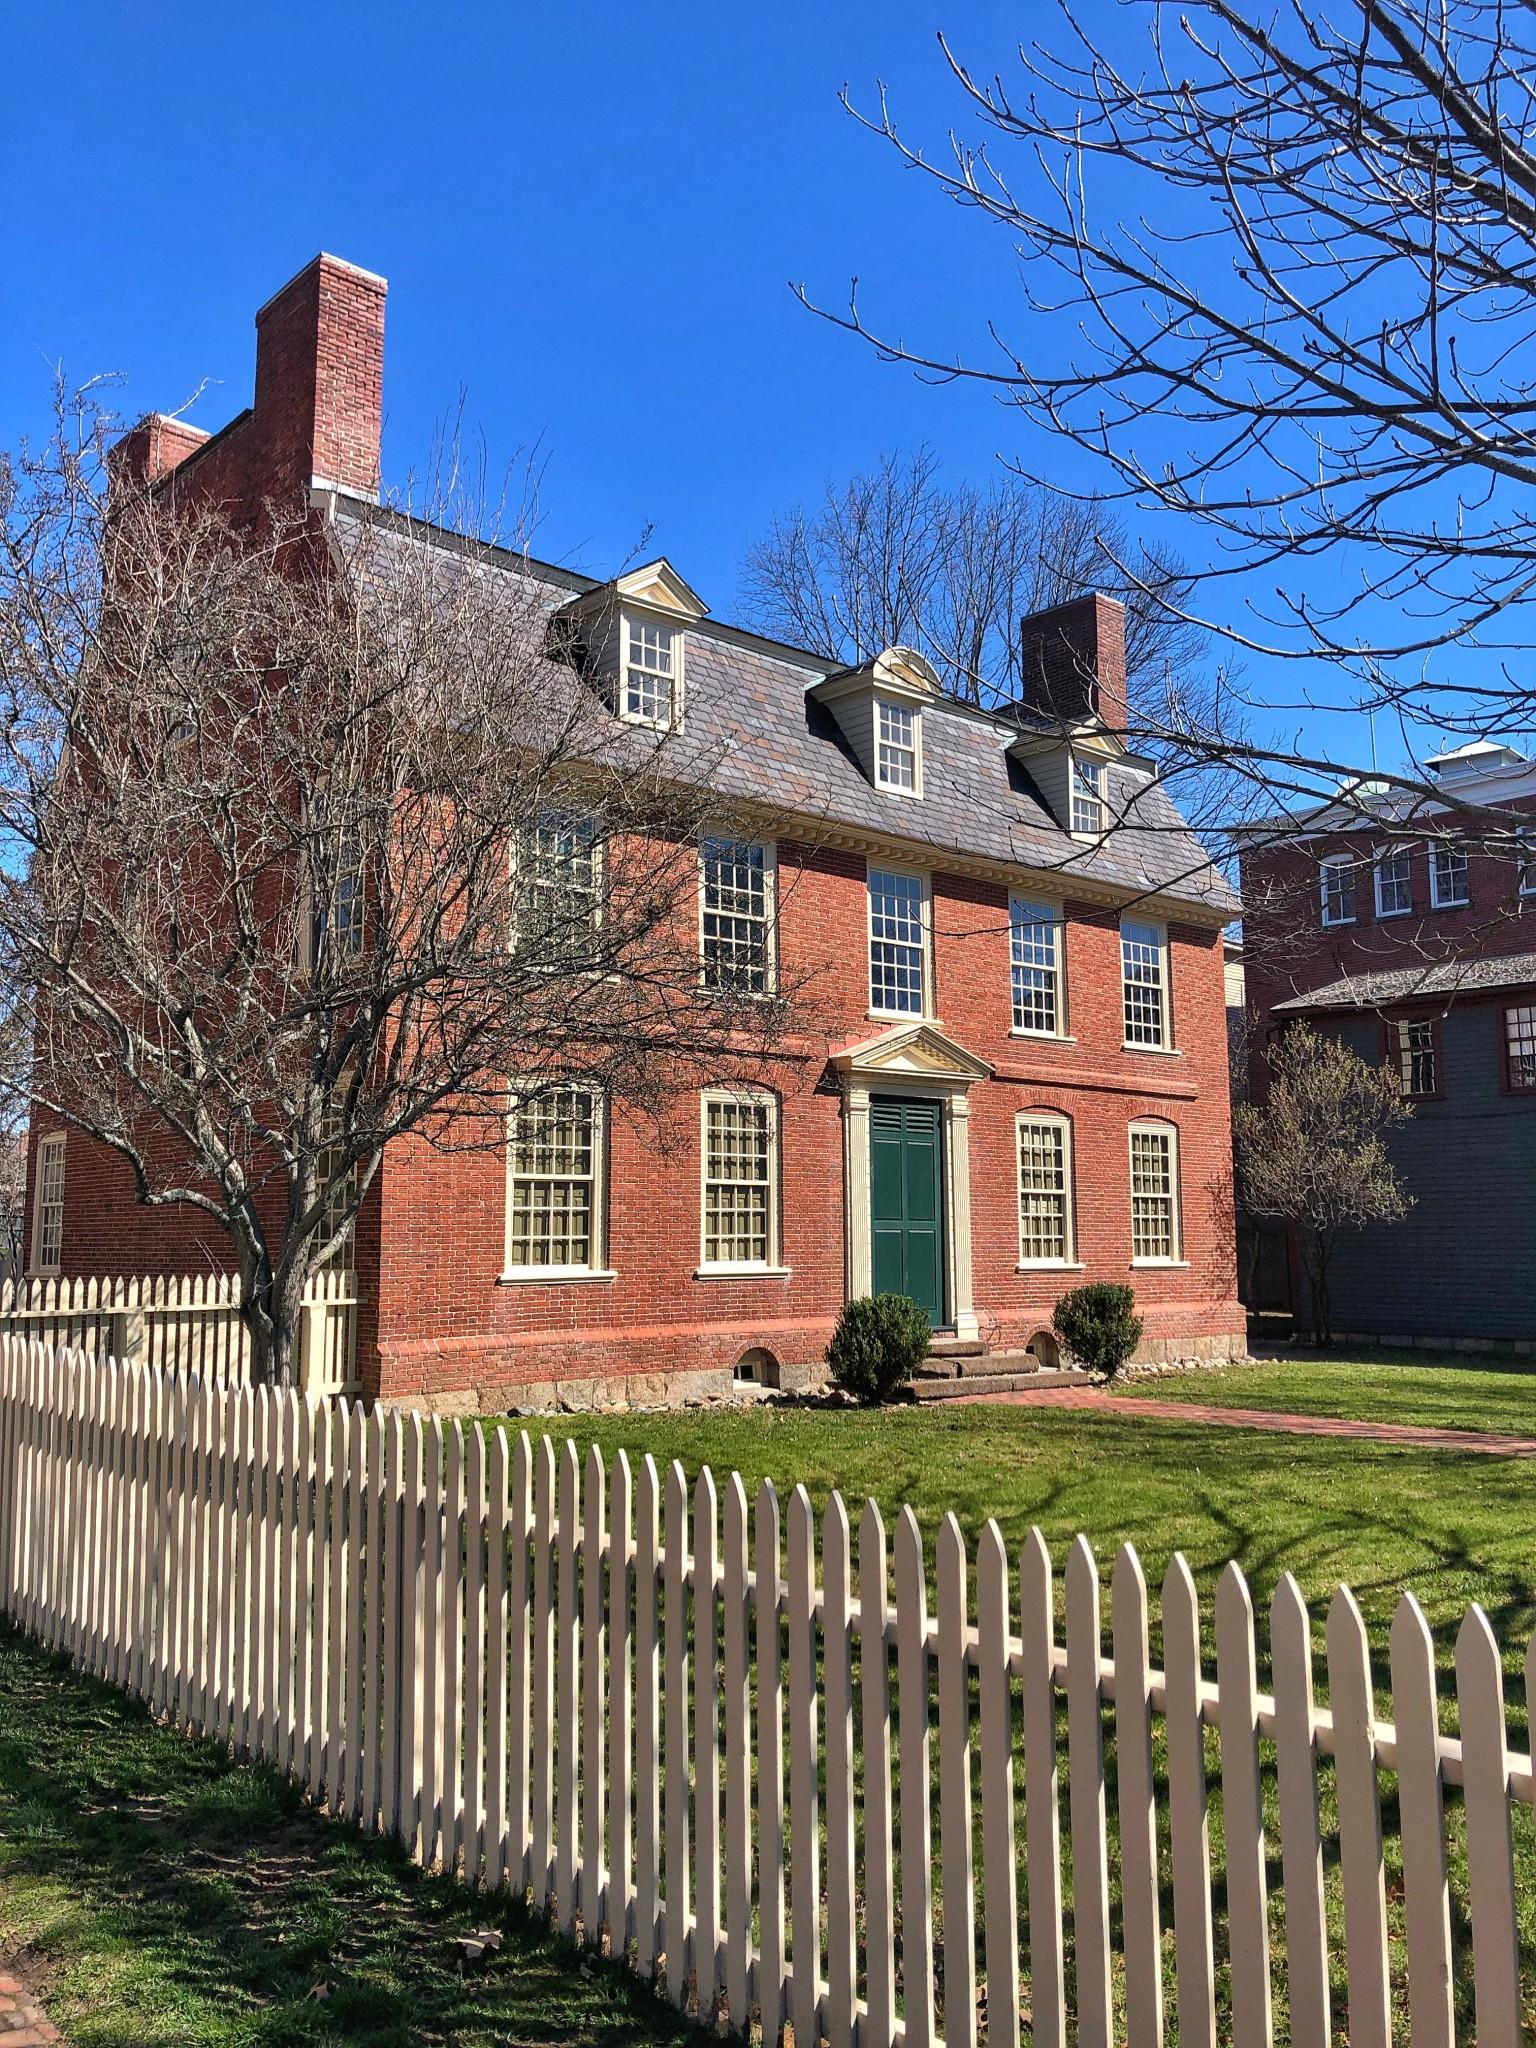 Derby House, salem, massachusetts, the-alyst.com